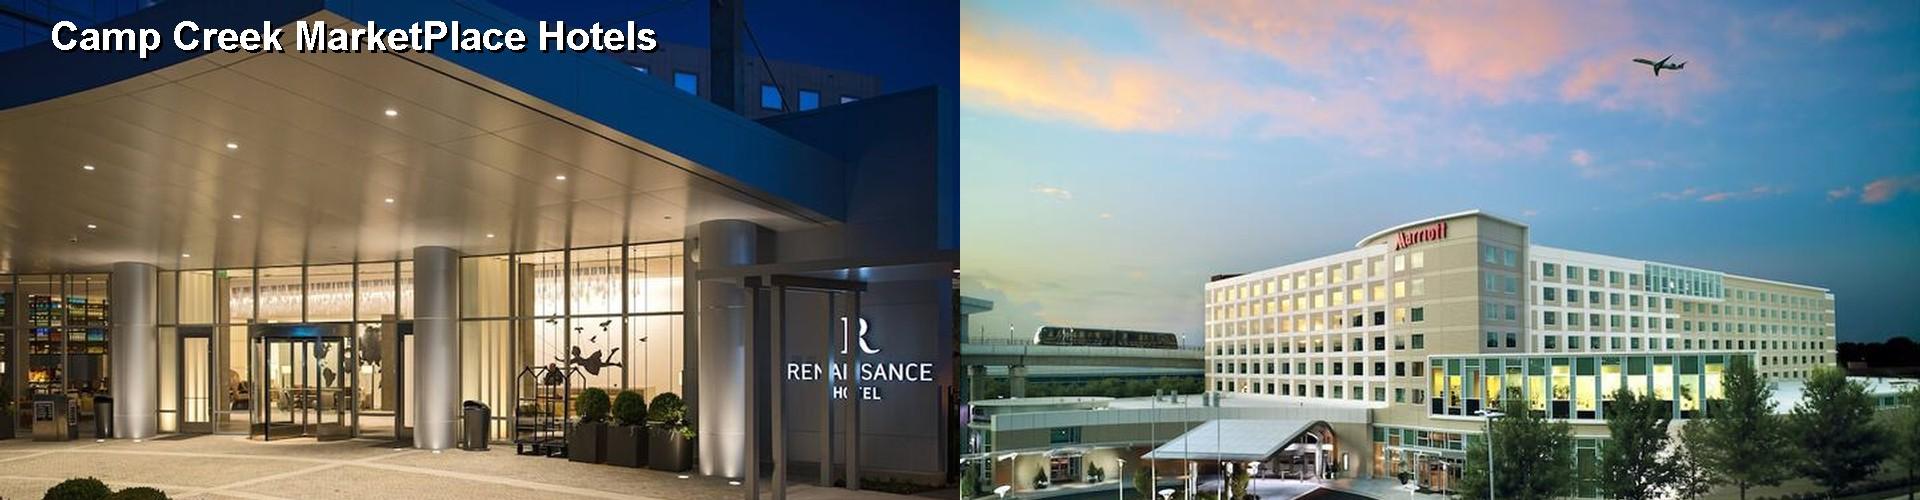 5 Best Hotels Near Camp Creek Marketplace